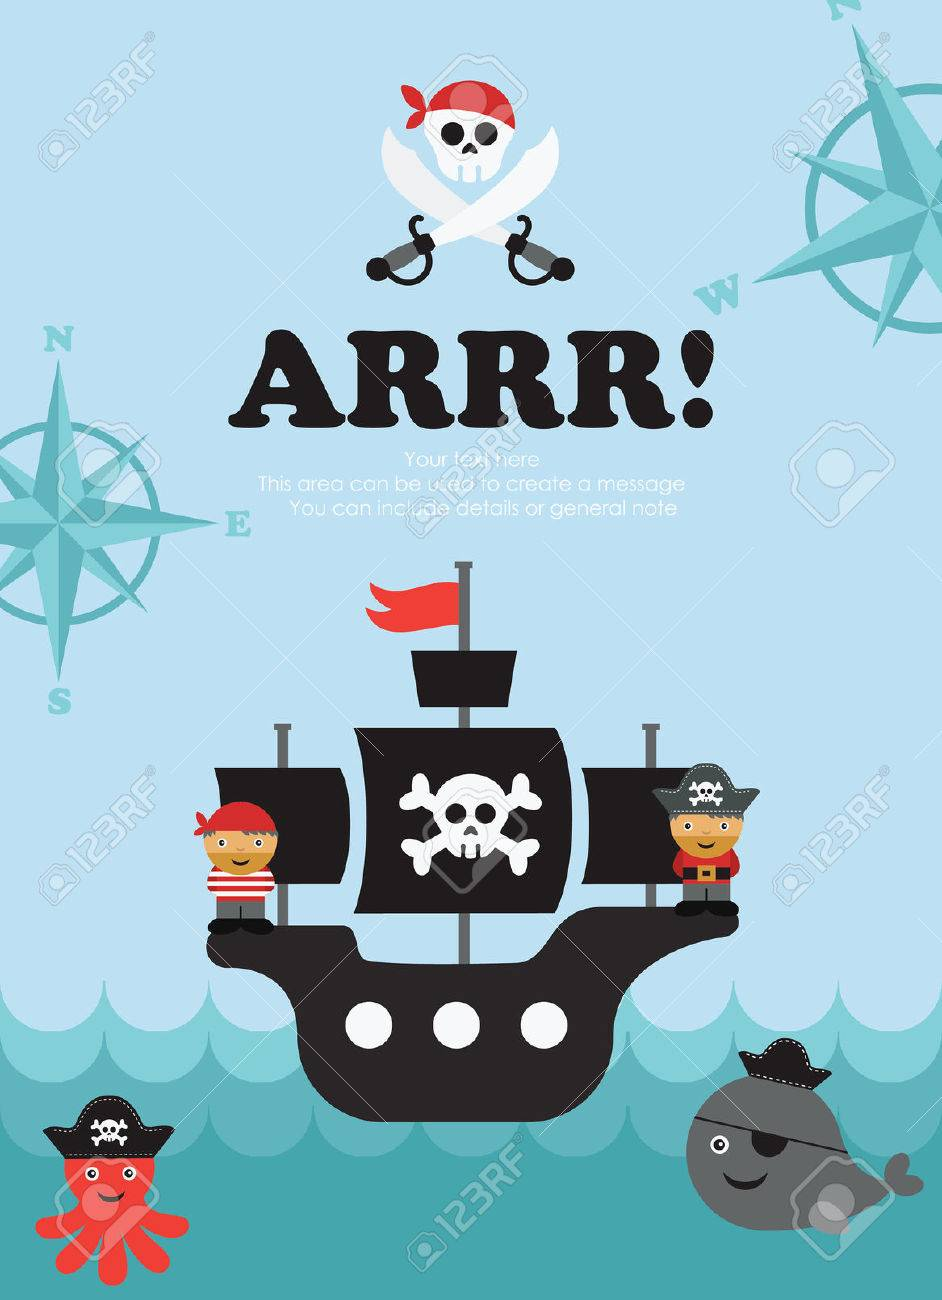 pirate card design. vector illustration Stock Vector - 27737603